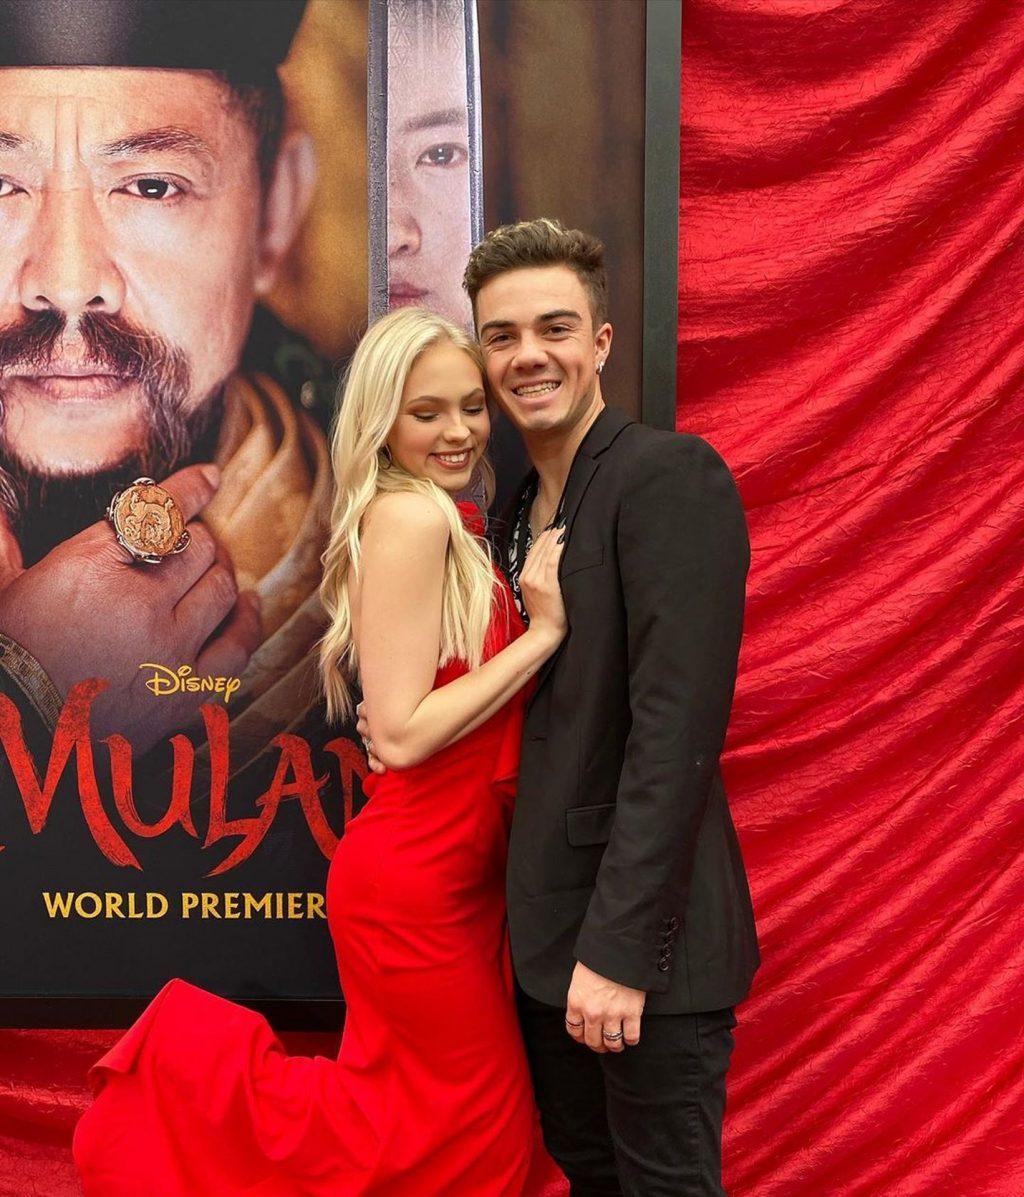 Jordyn Jones Looks Hot in a Red Dress at the Disney's Mulan World Premiere (36 Photos)